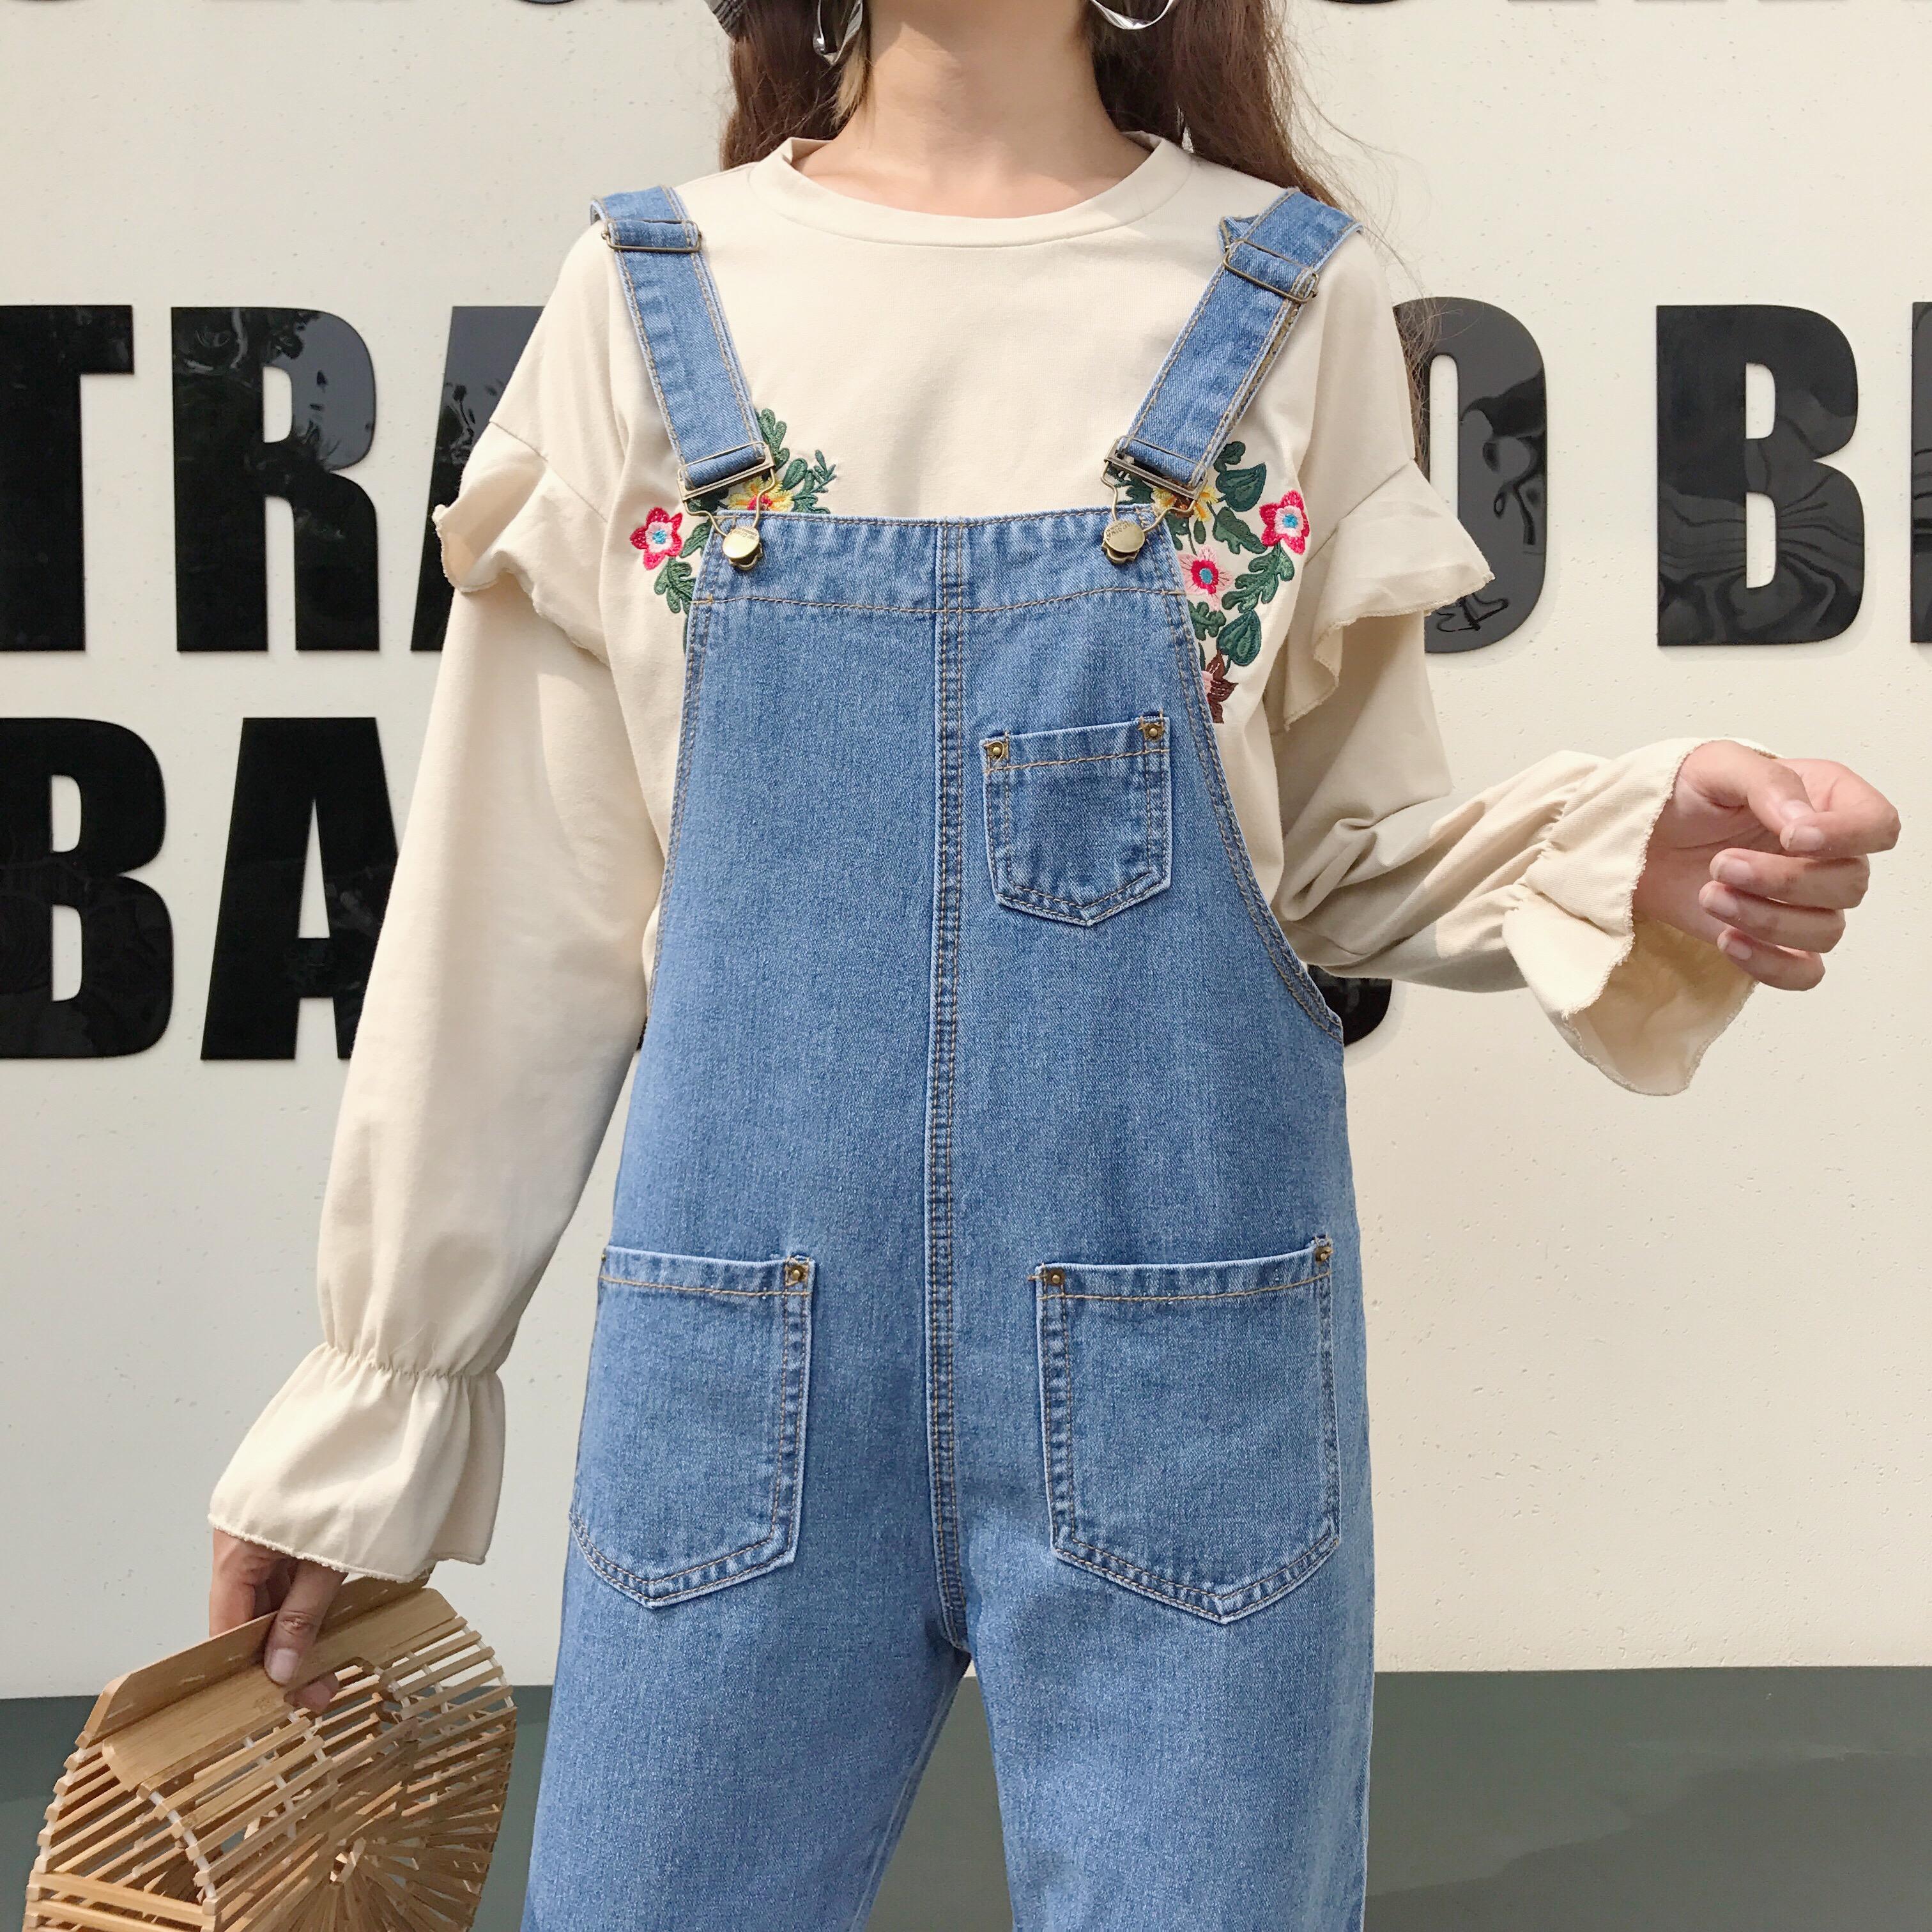 c0847ed4b0 Women Spring Personality Bib Loose Casual Jumper Pants Jeans Jumpsuit